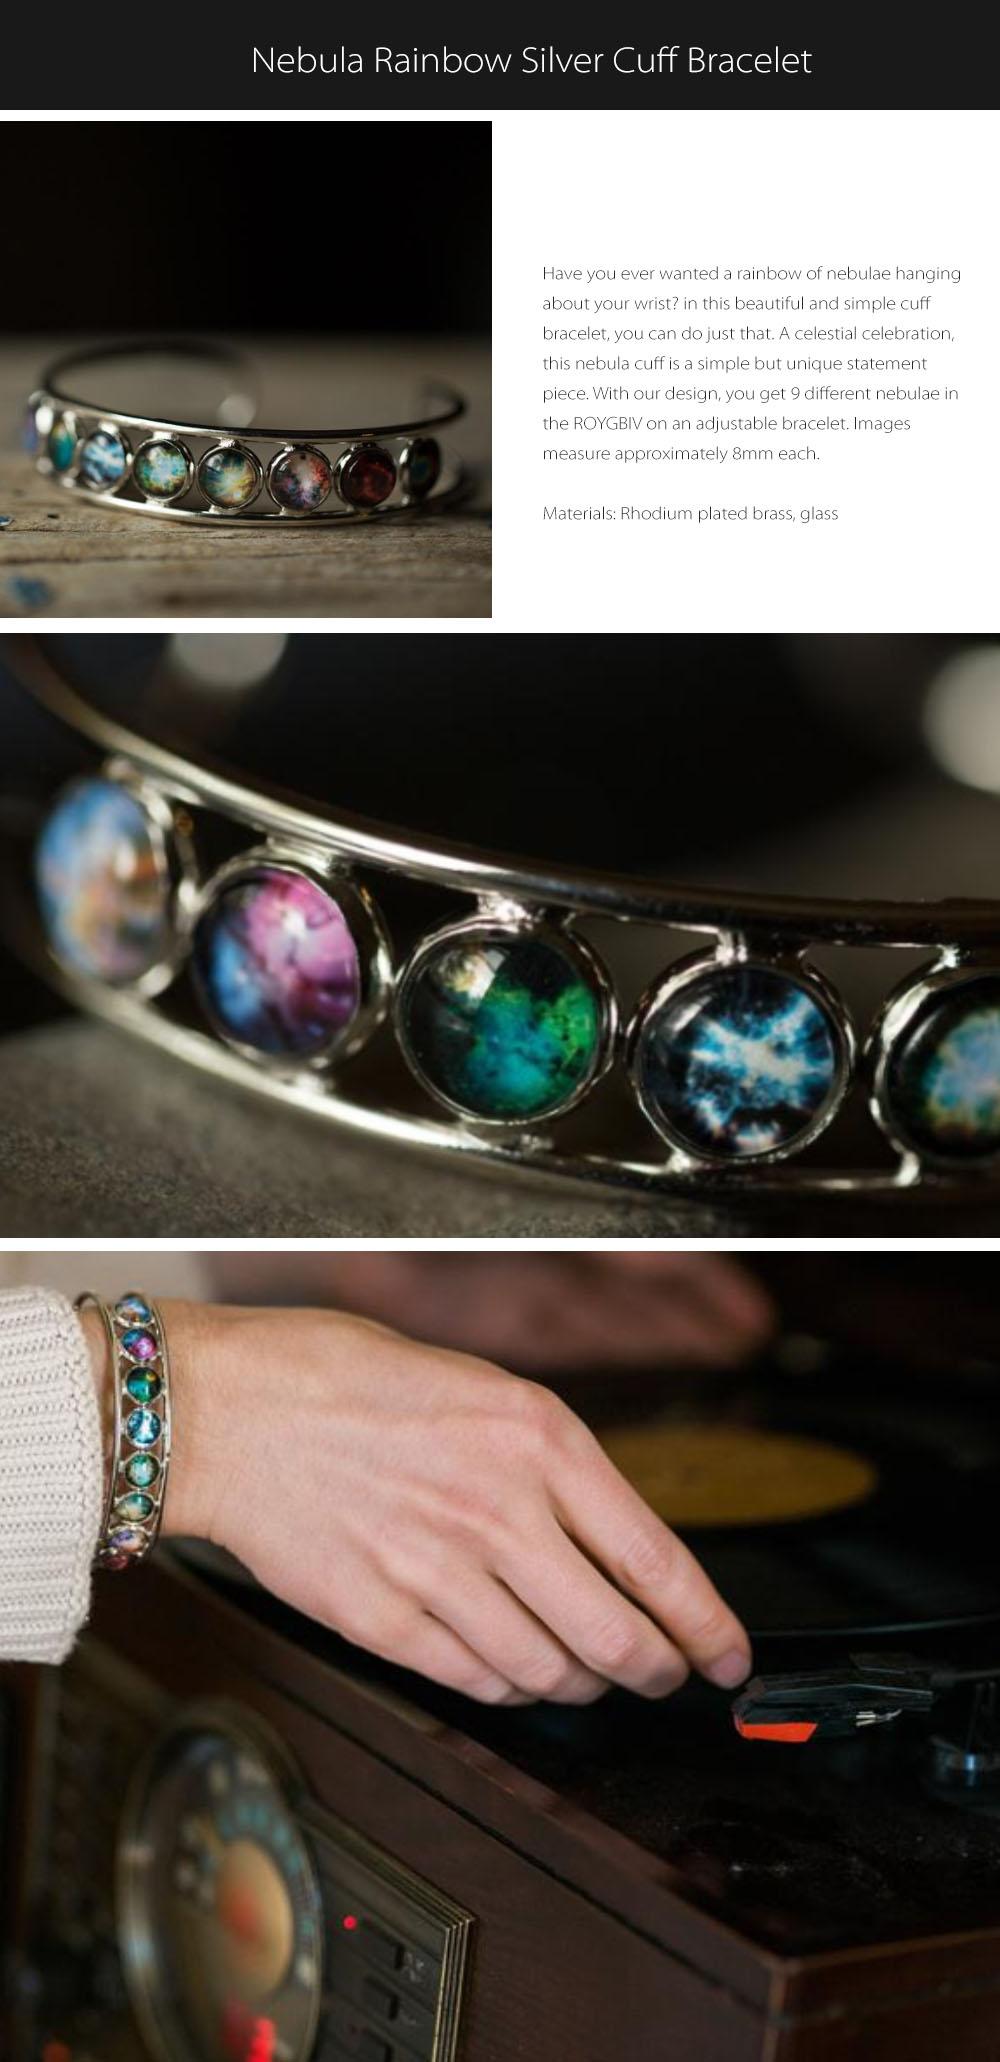 Nebula Cuff Bracelet Rainbow Silver